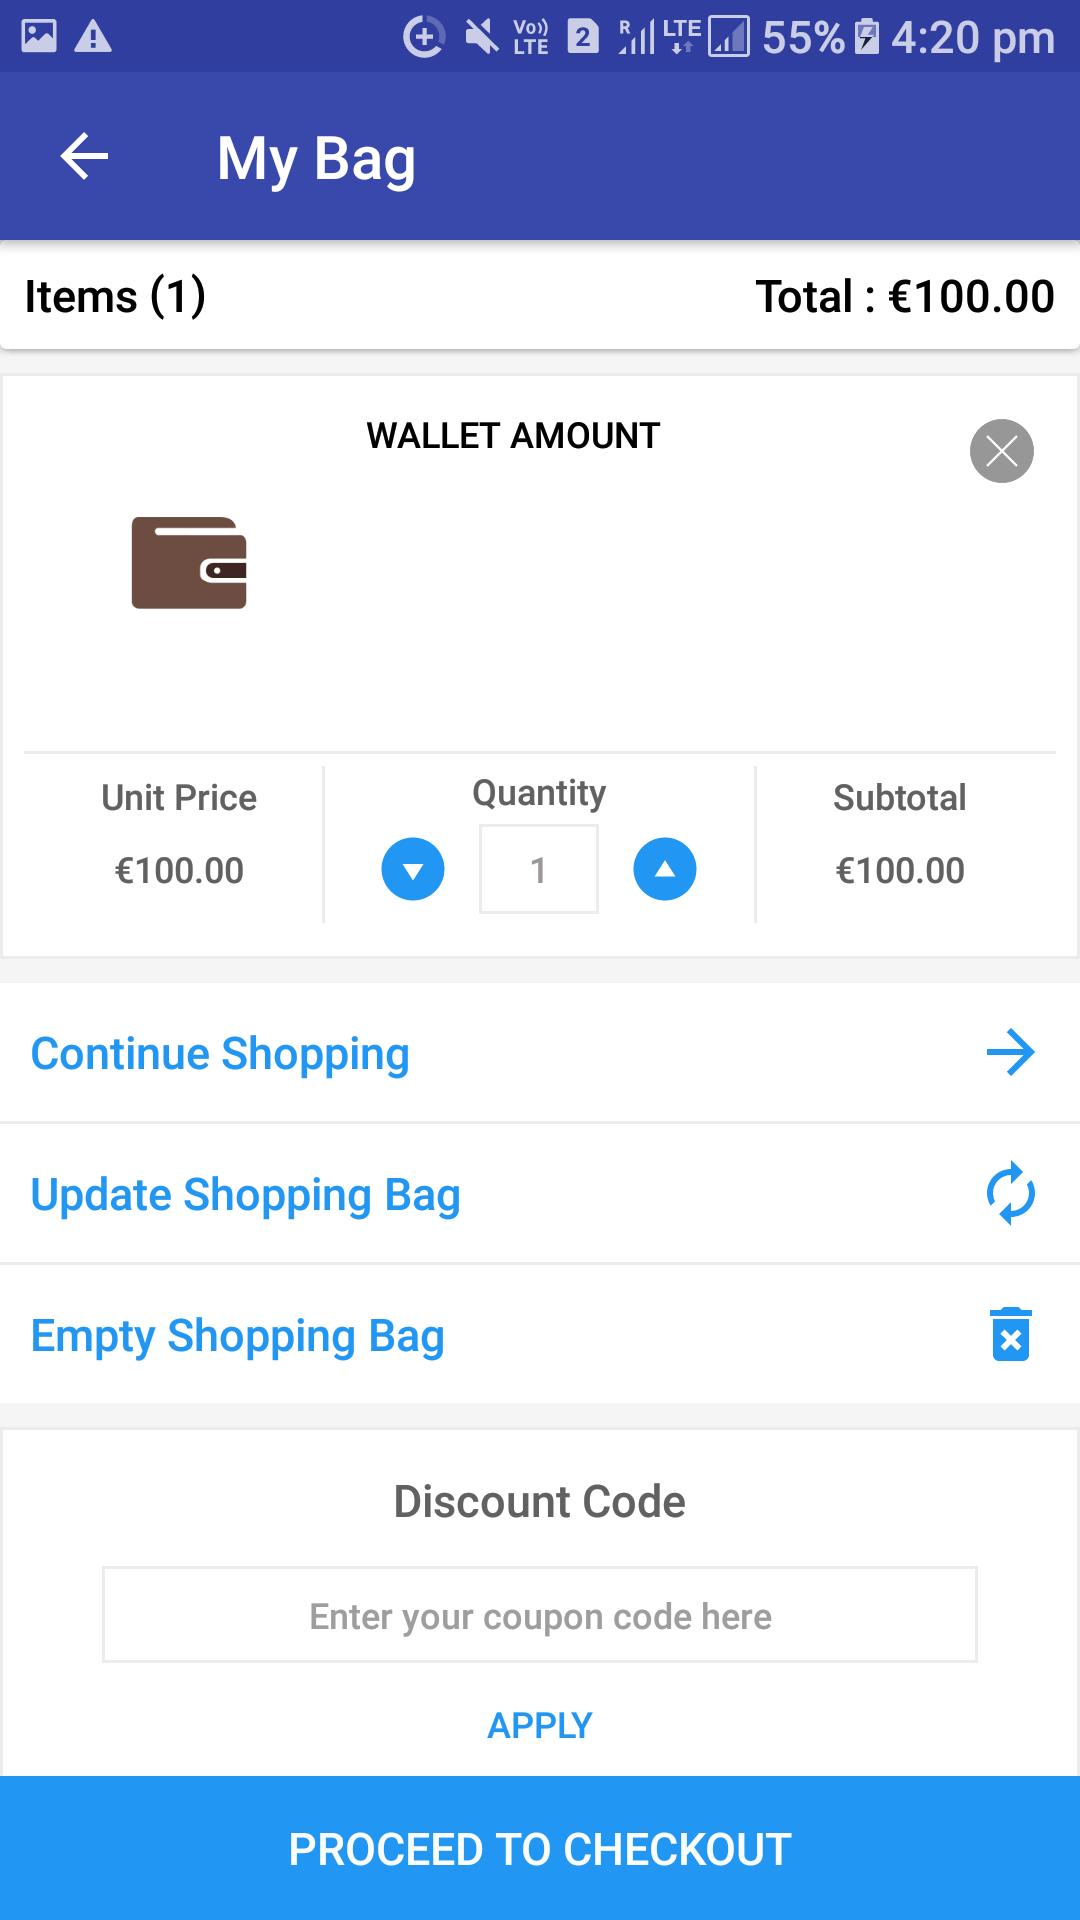 Opencart Mobikul Wallet - Check Wallet Amount